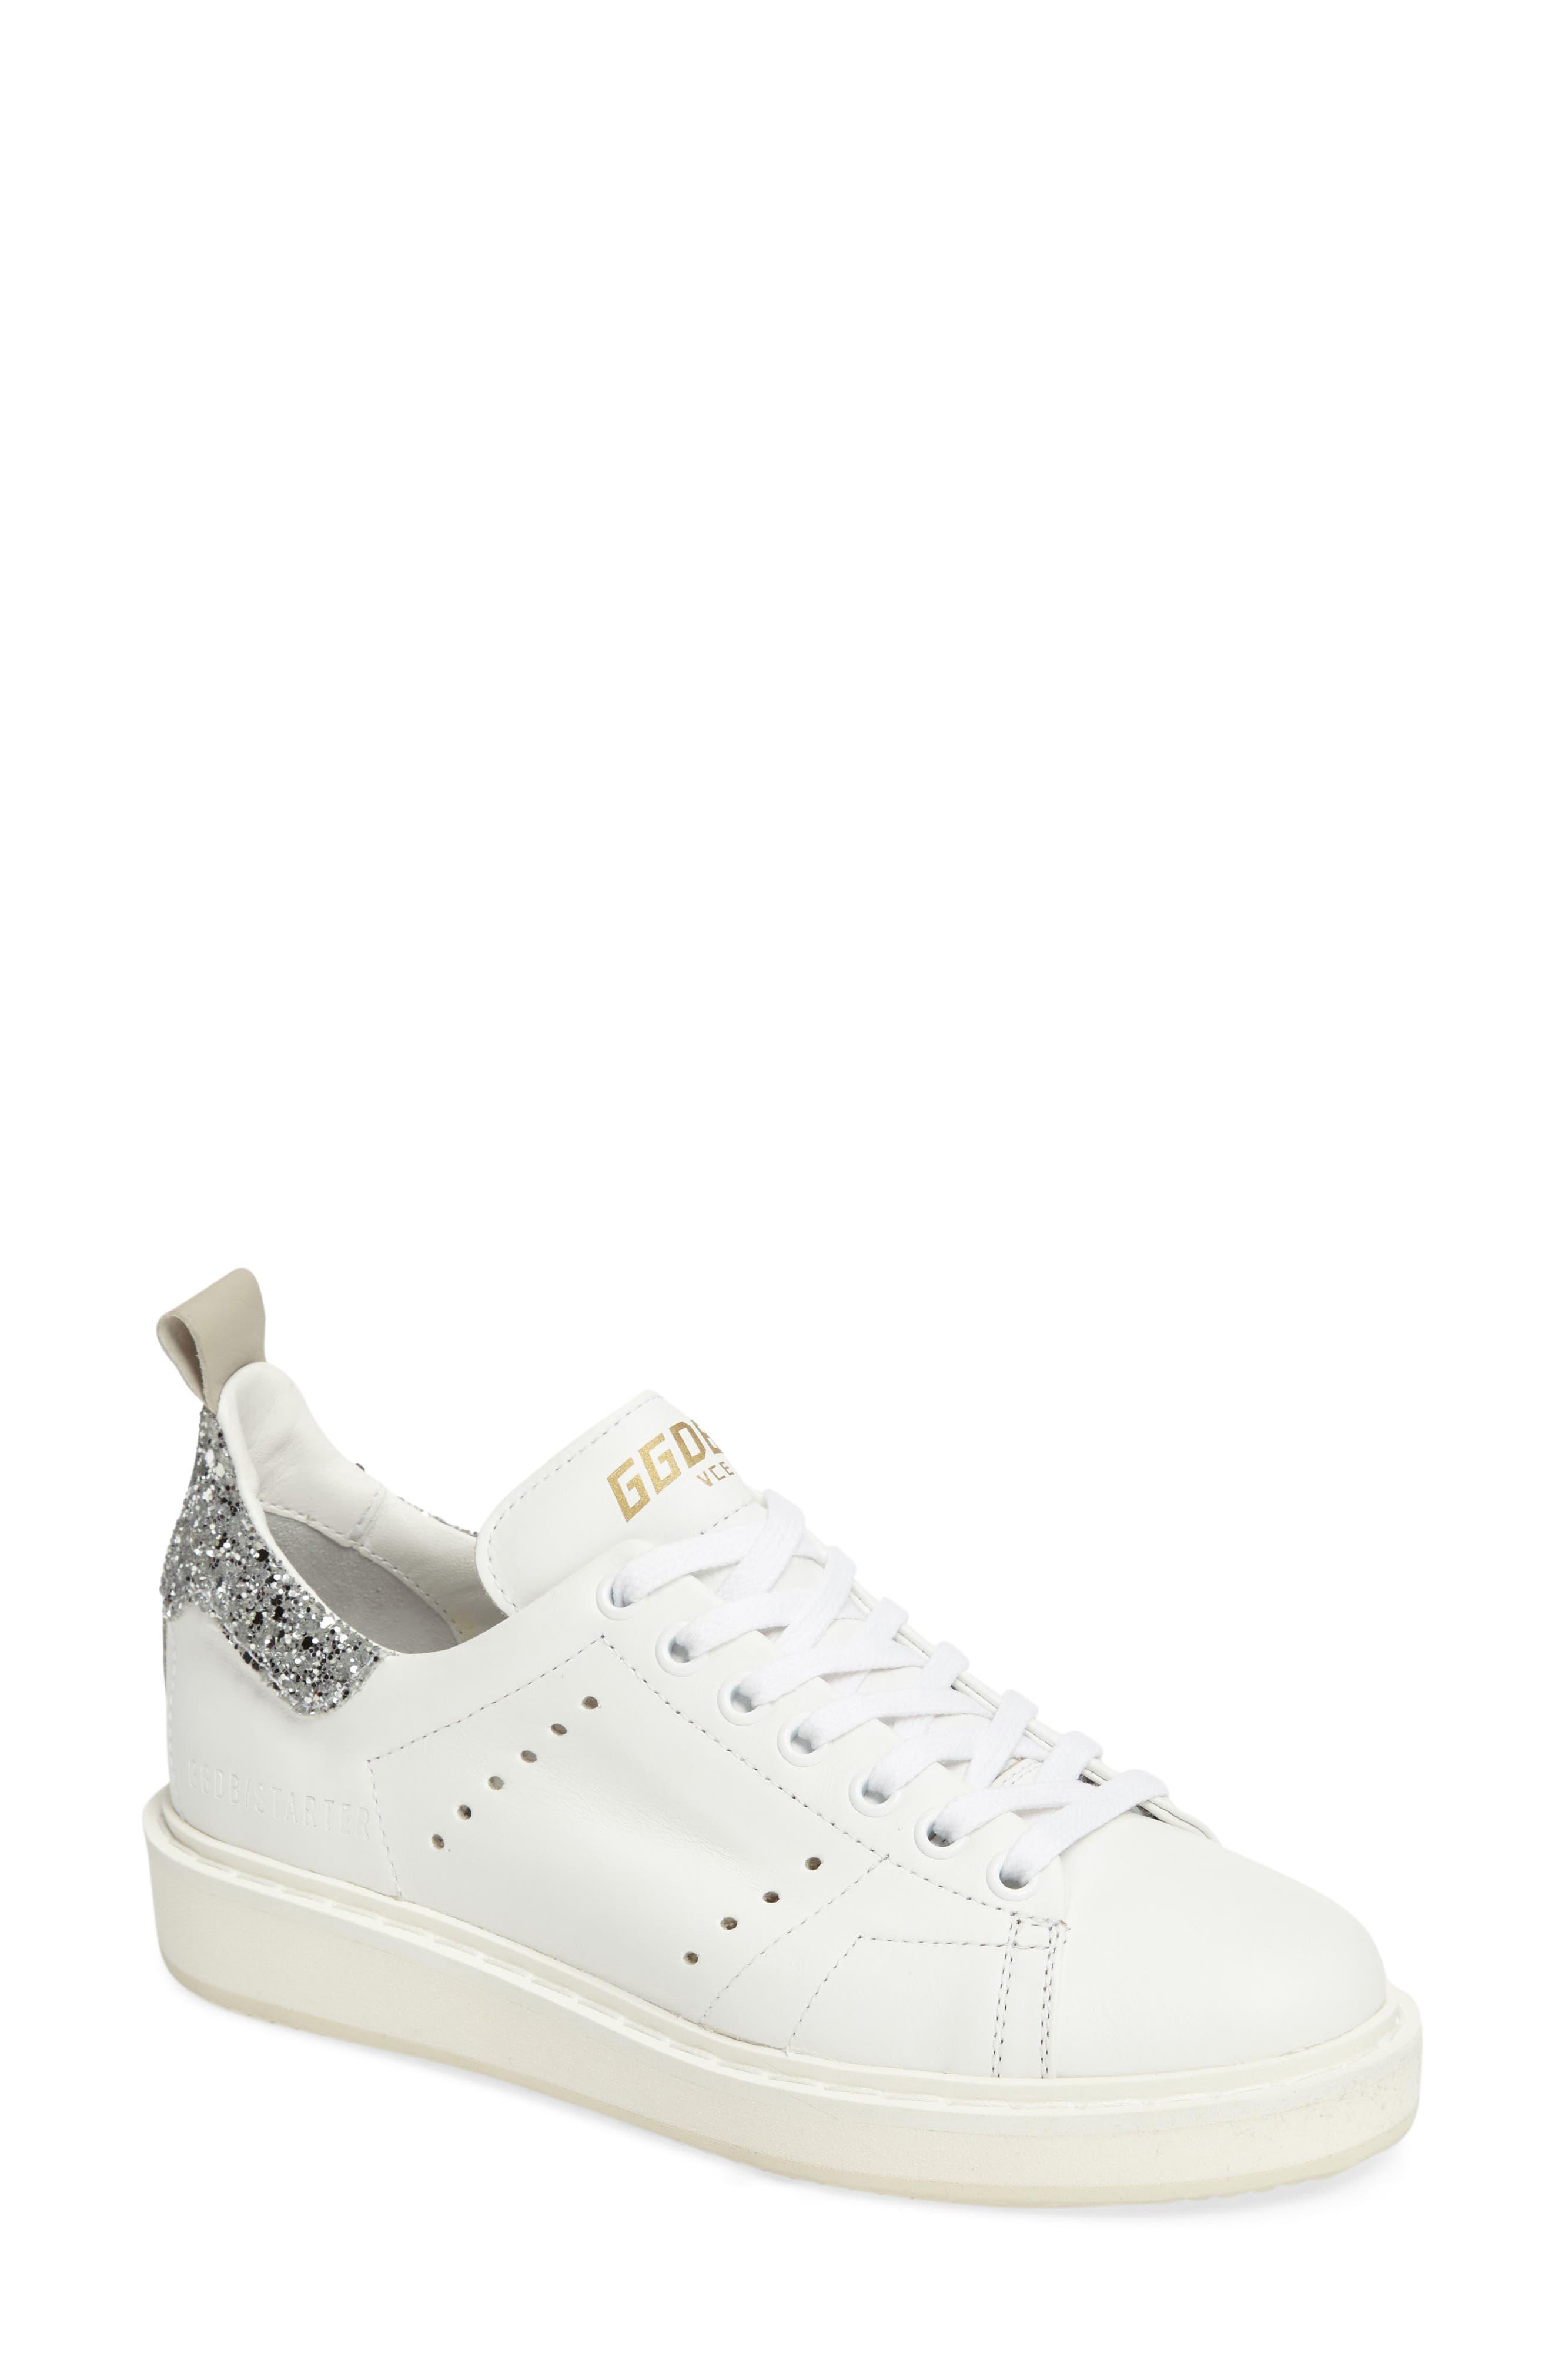 'Starter' Low Top Sneaker,                         Main,                         color, White/ Silver Glitter